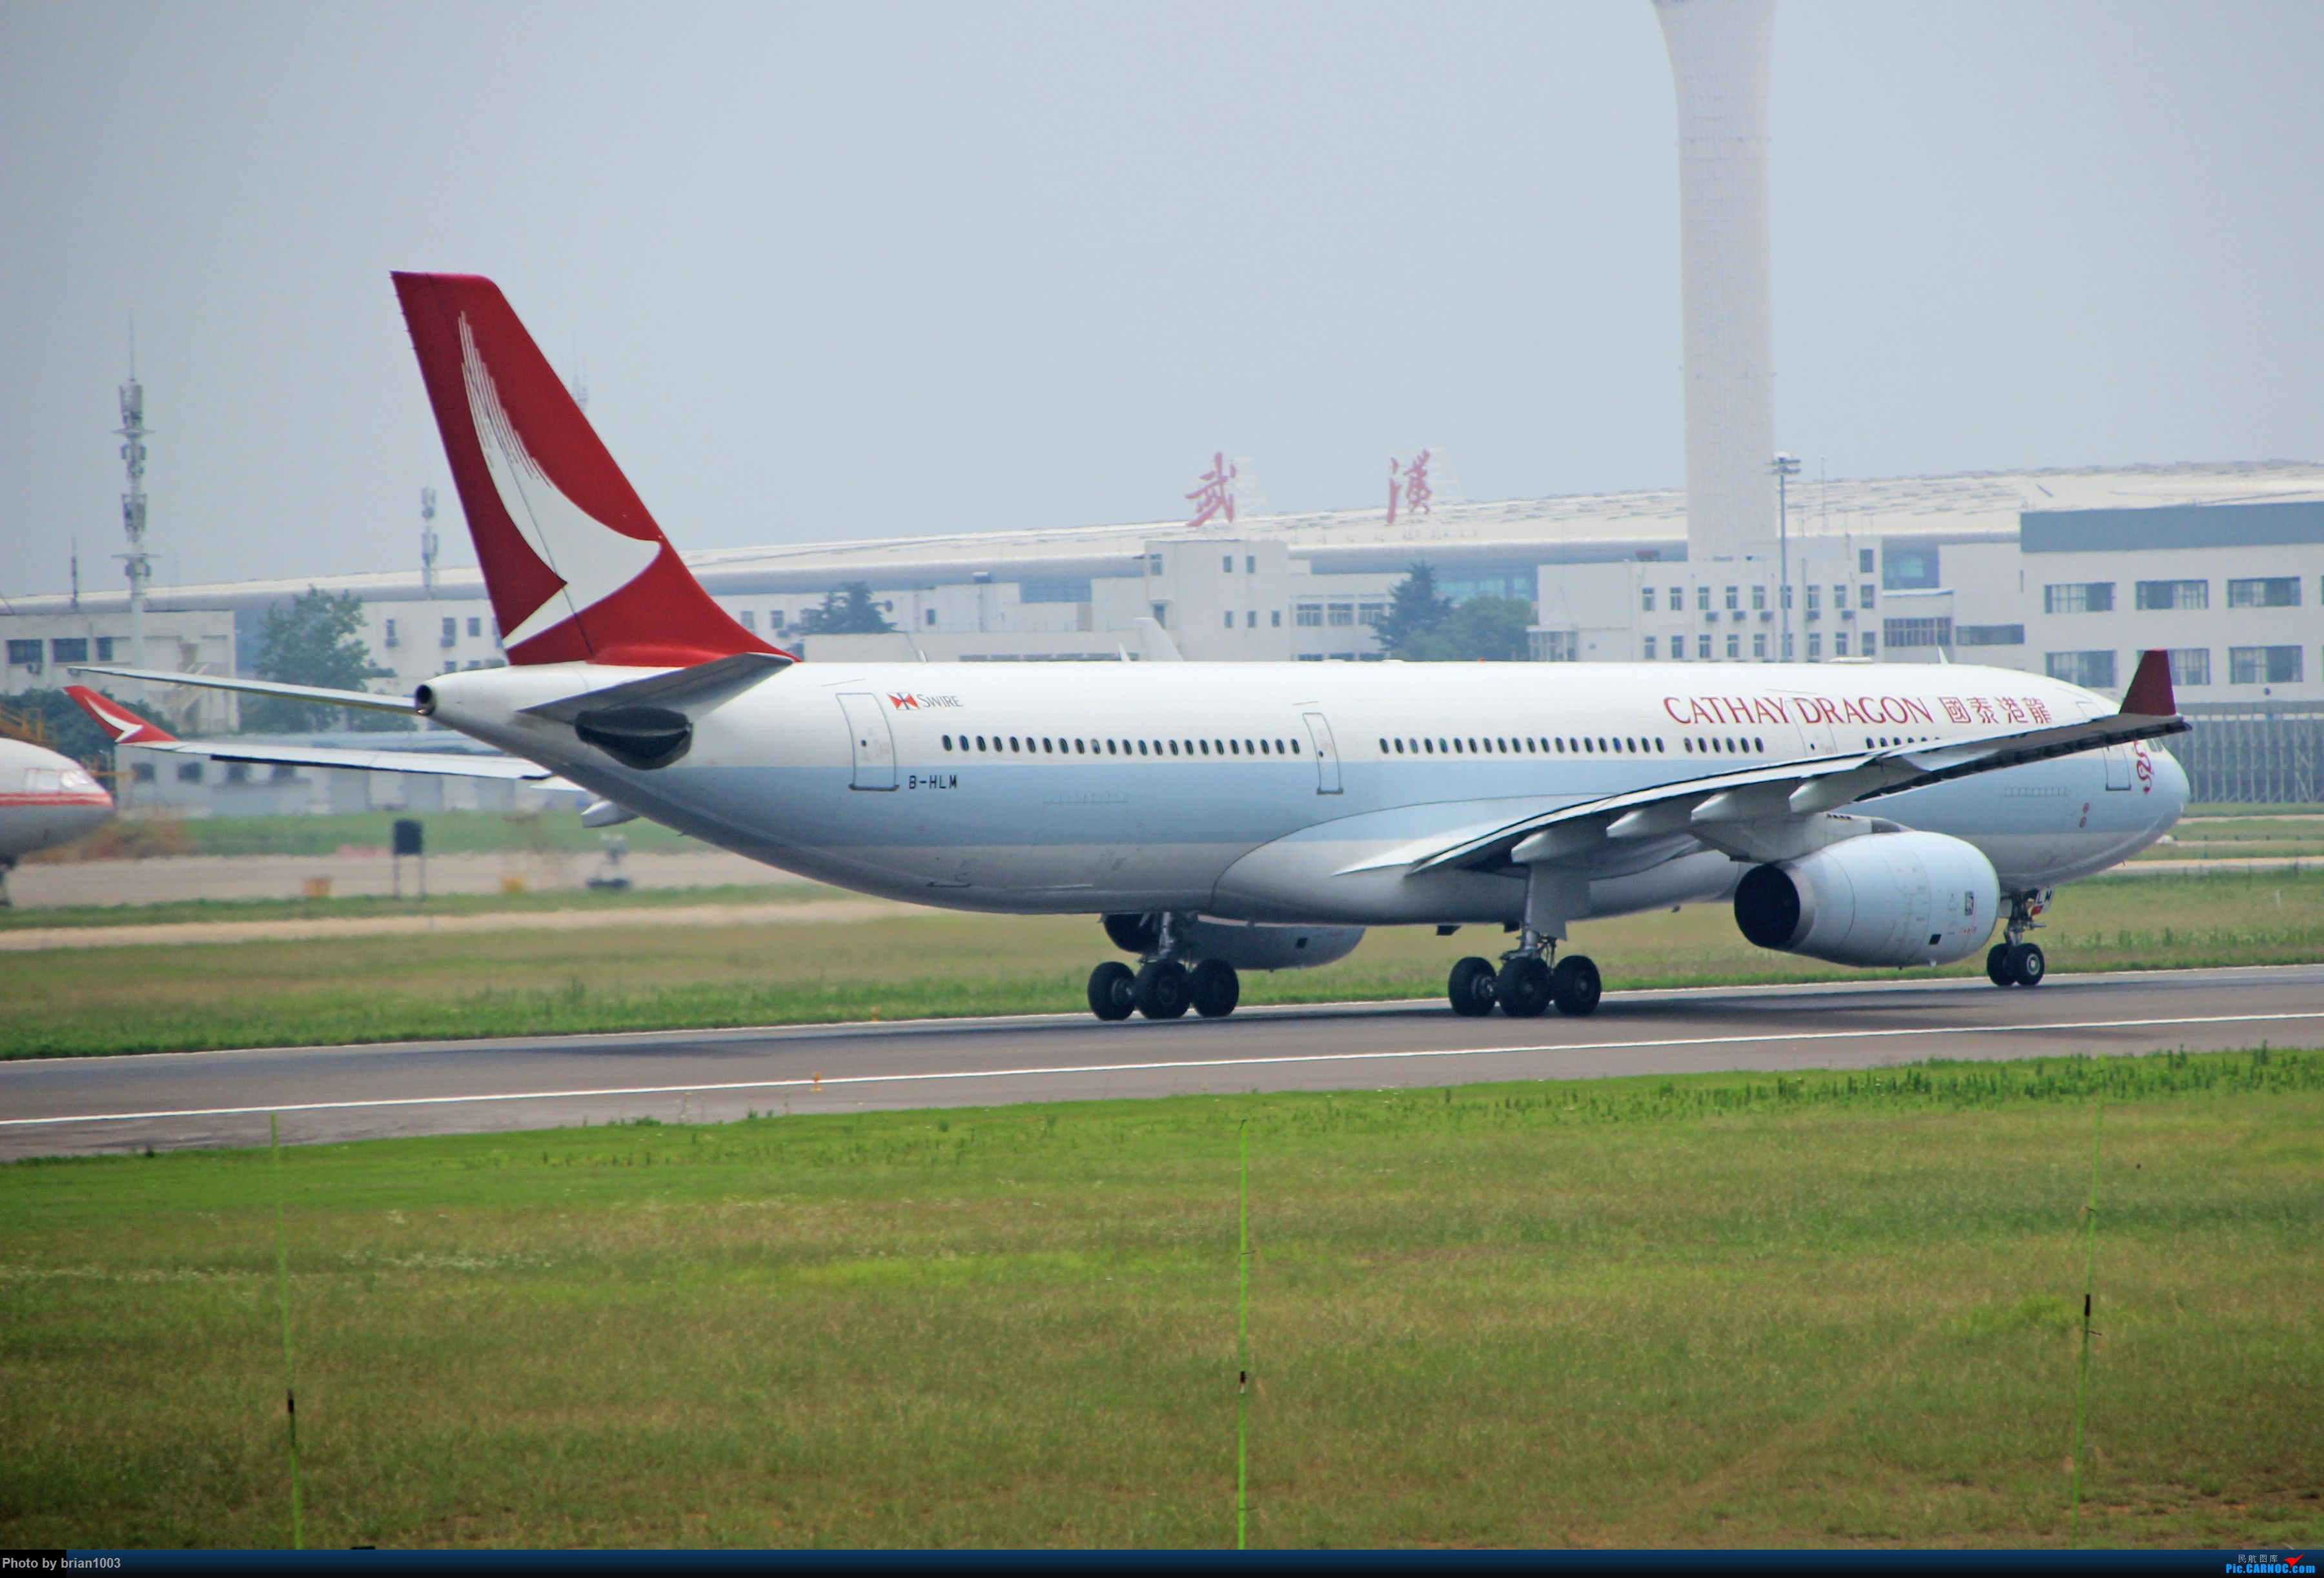 Re:[原创]WUH天河机场拍机之六月还有啥(X7家744F、天津大韩港龙333、巴基斯坦772、B6419、ER-BBJ 74F、某菊塞斯纳、俄航国航77W) AIRBUS A330-300 B-HLM 中国武汉天河国际机场